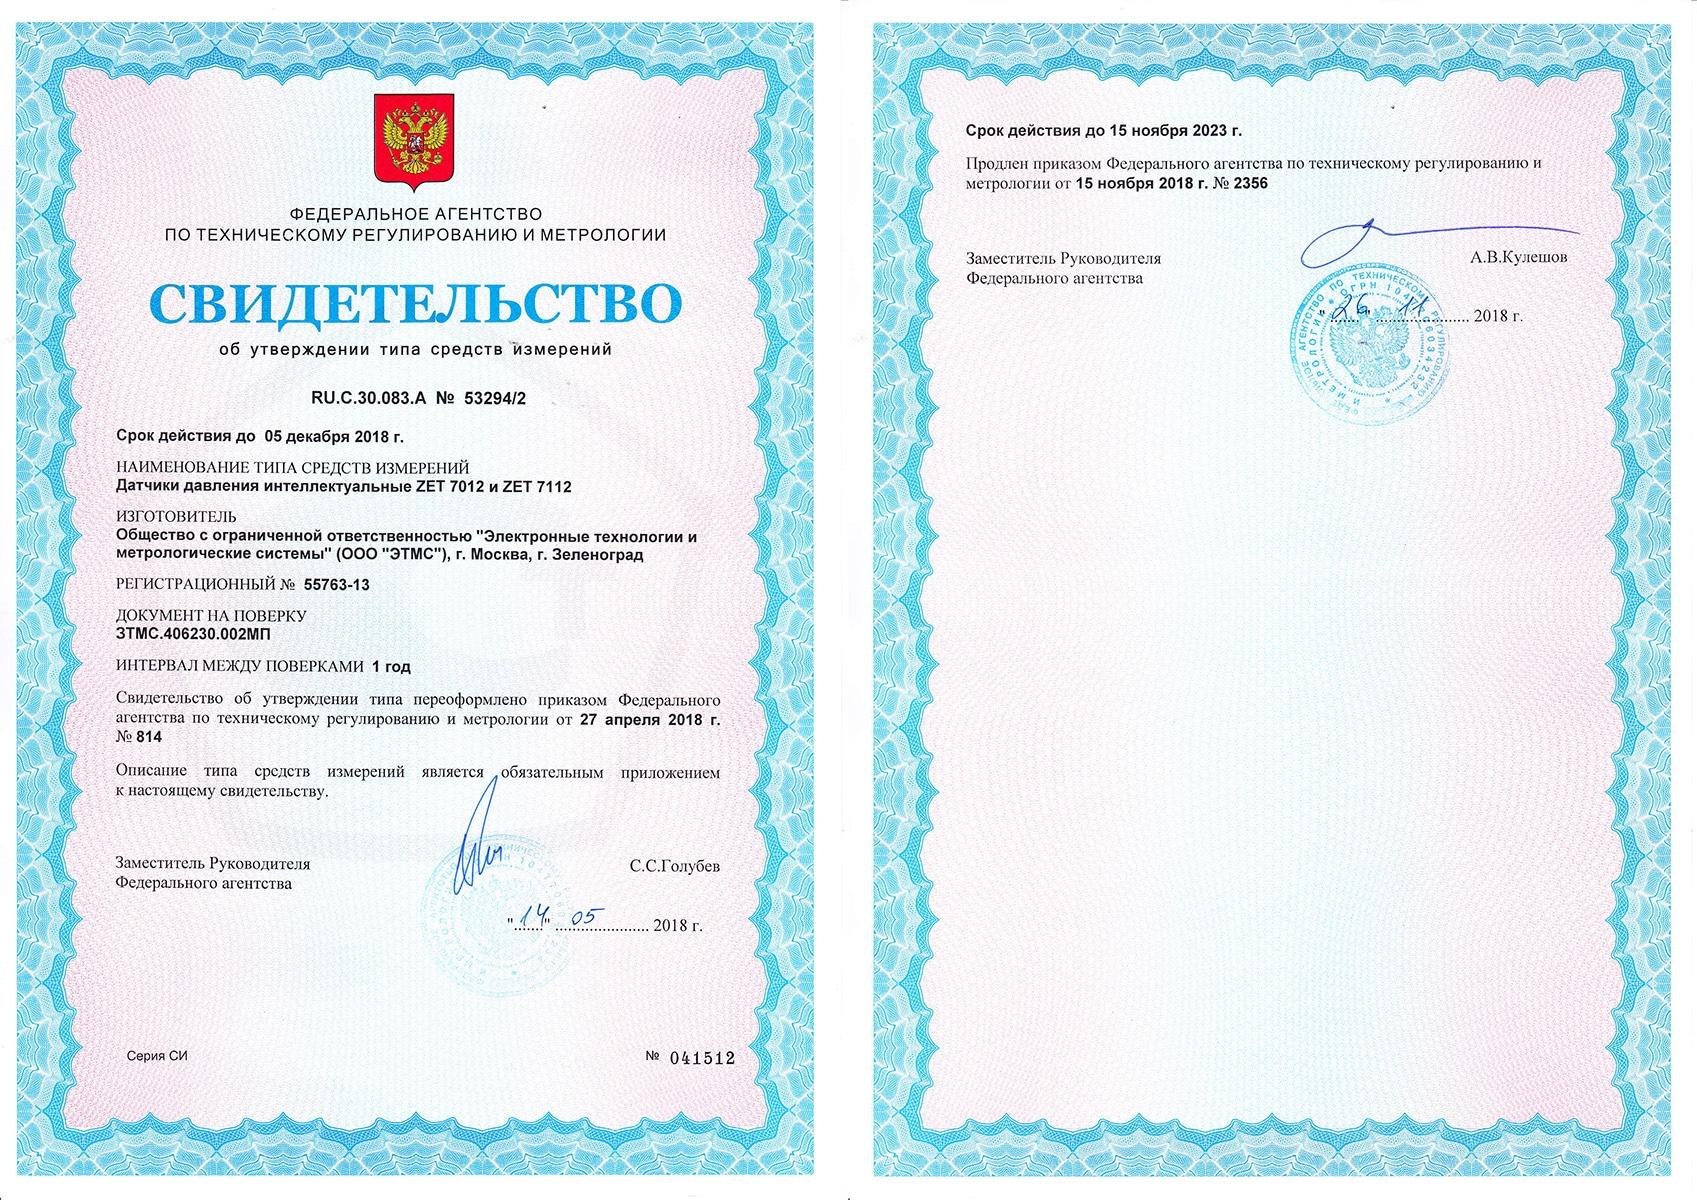 Svidetelstvo-ZET-7X12-do-2023-1